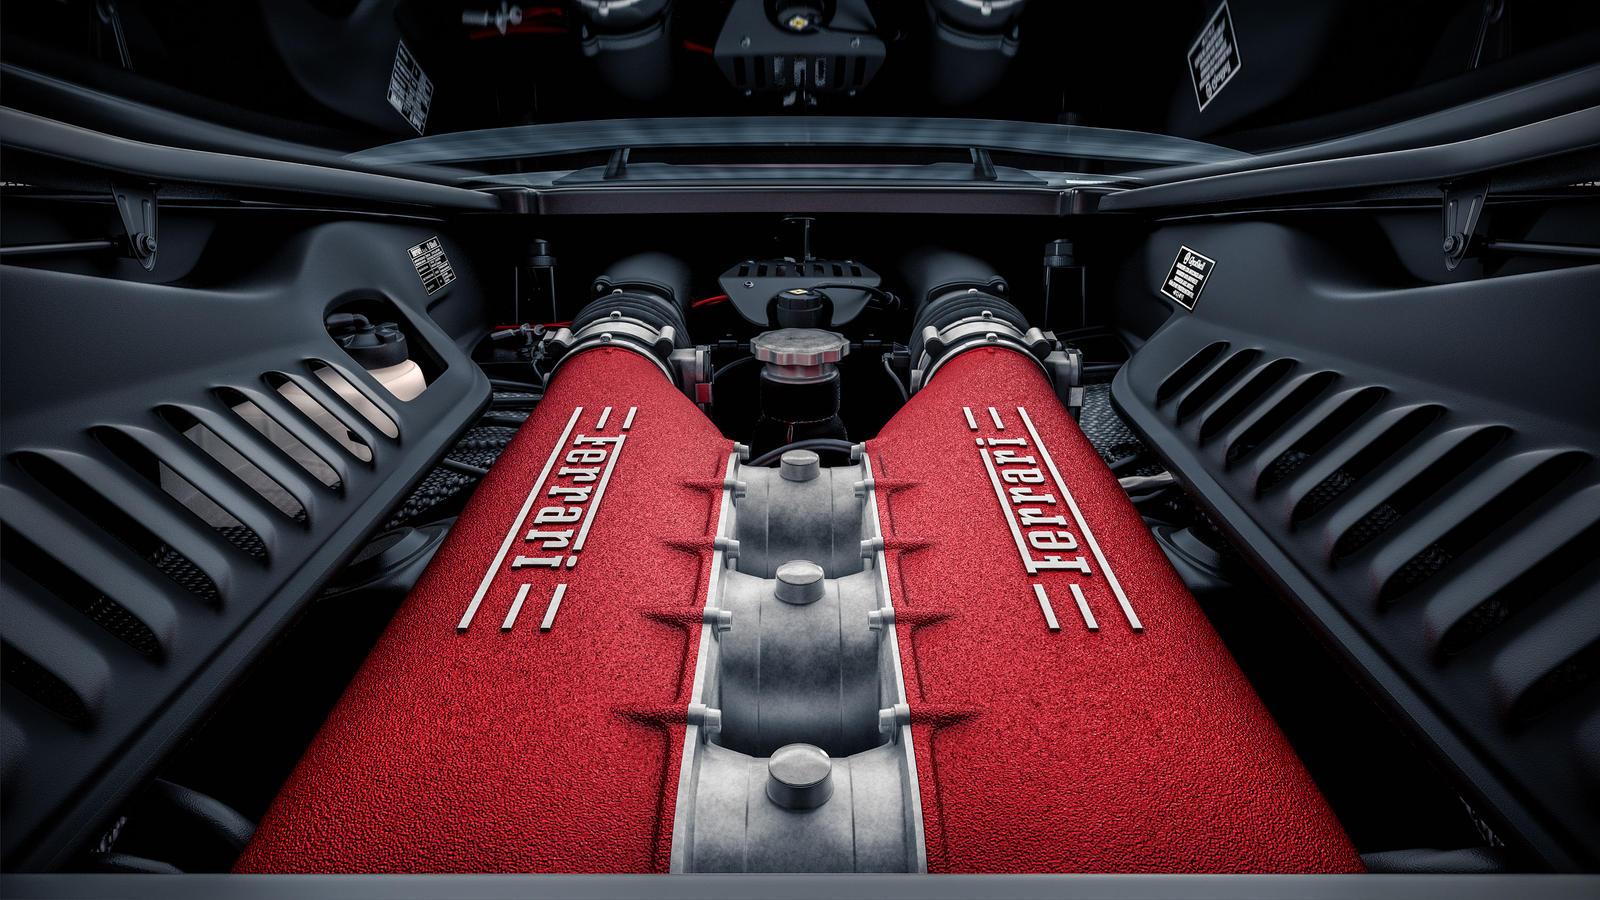 Ferrari 458italia powerplant by NasG85